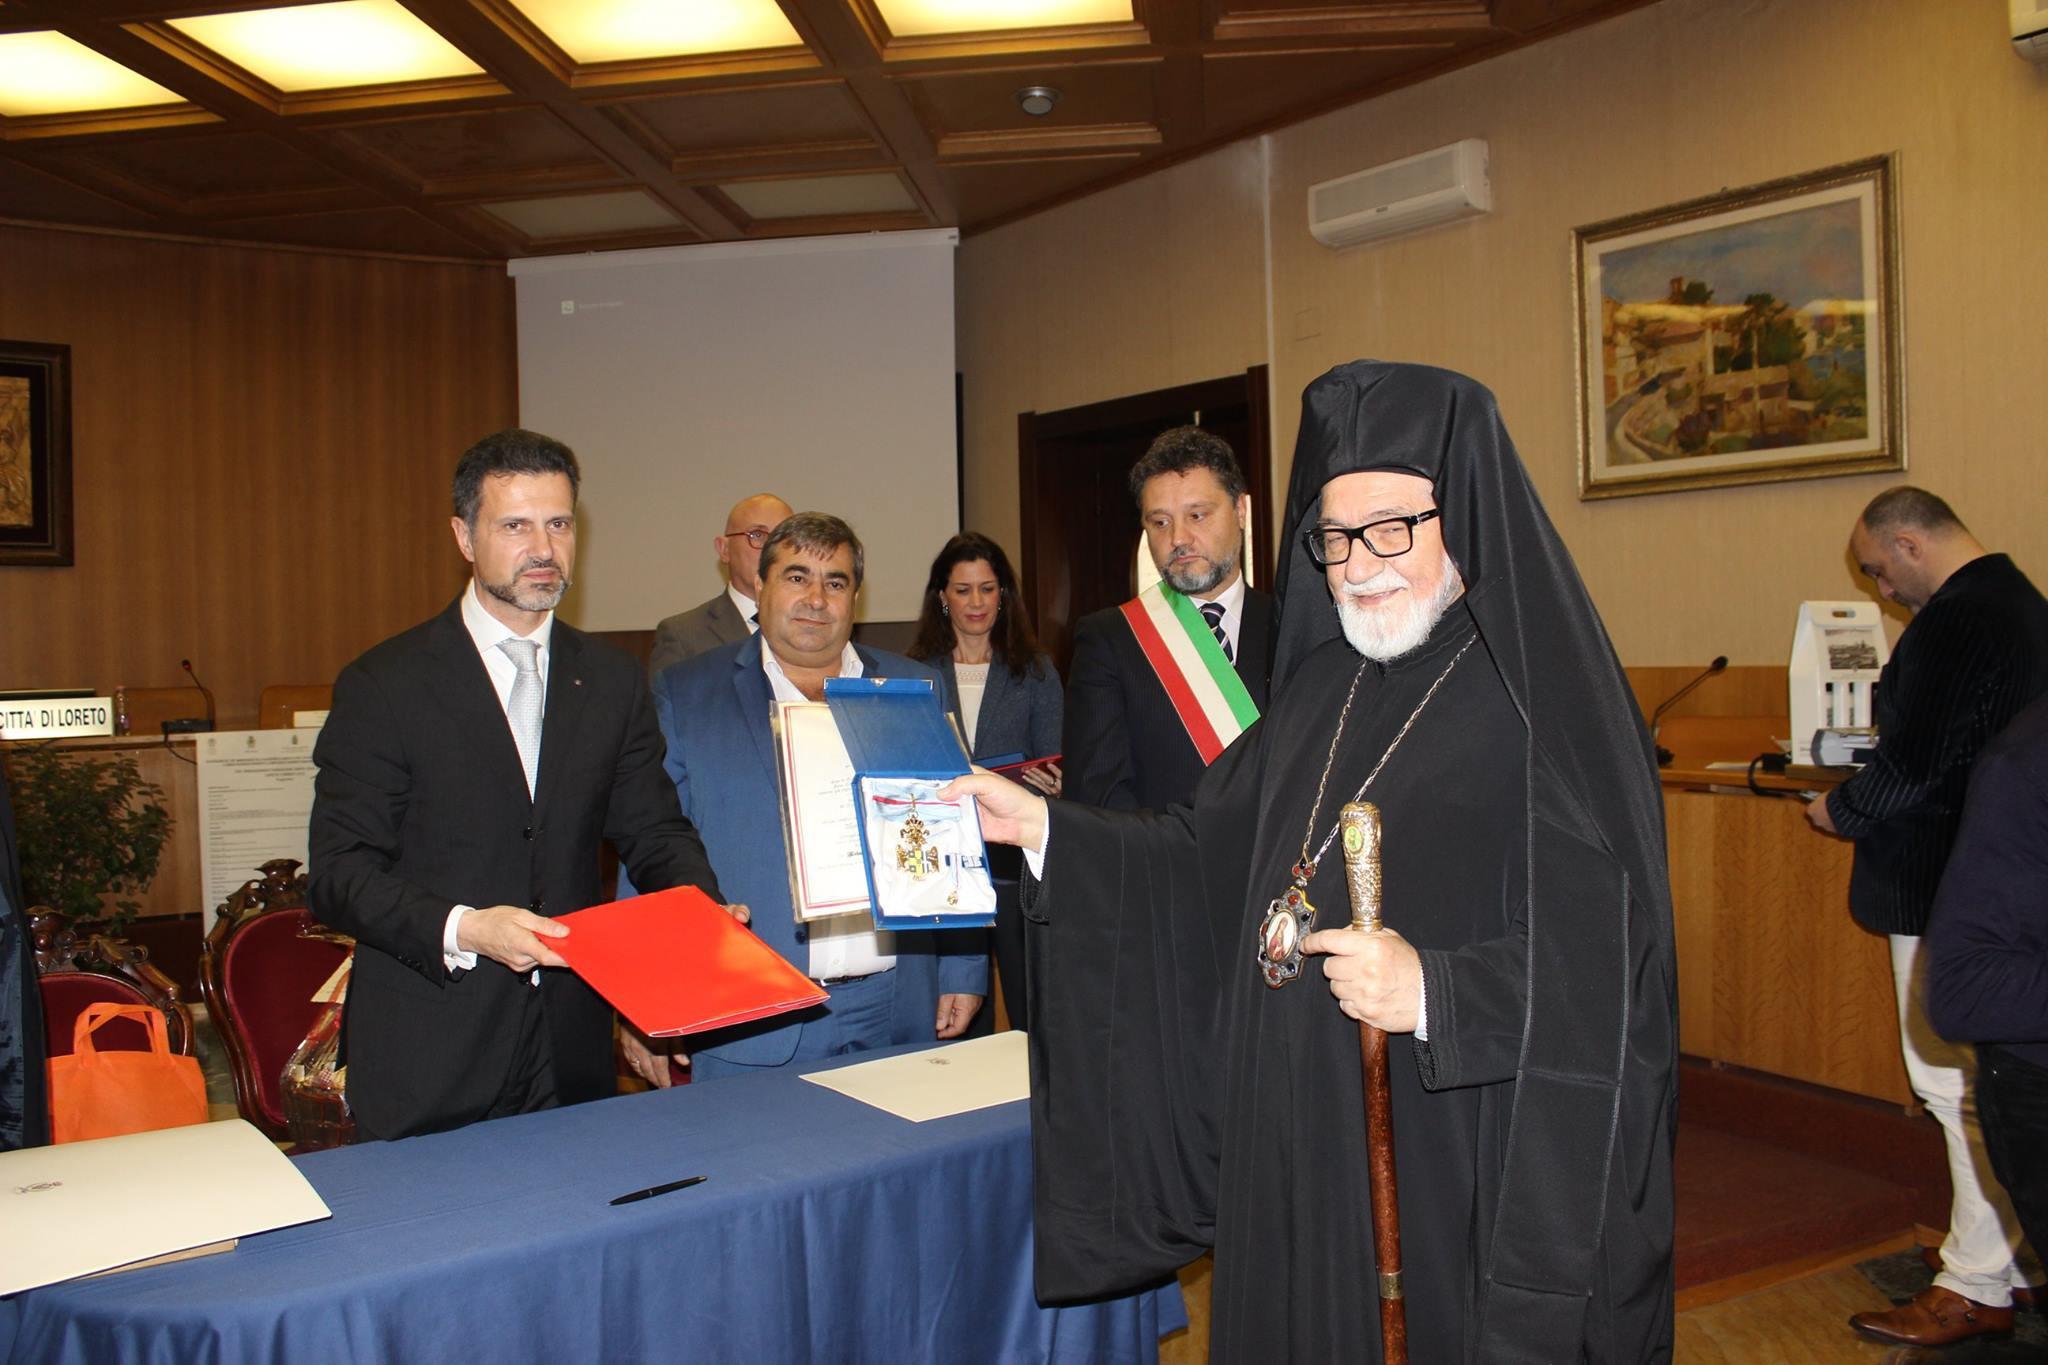 conferimento medaglia benemerenza S.E. Ghennadios